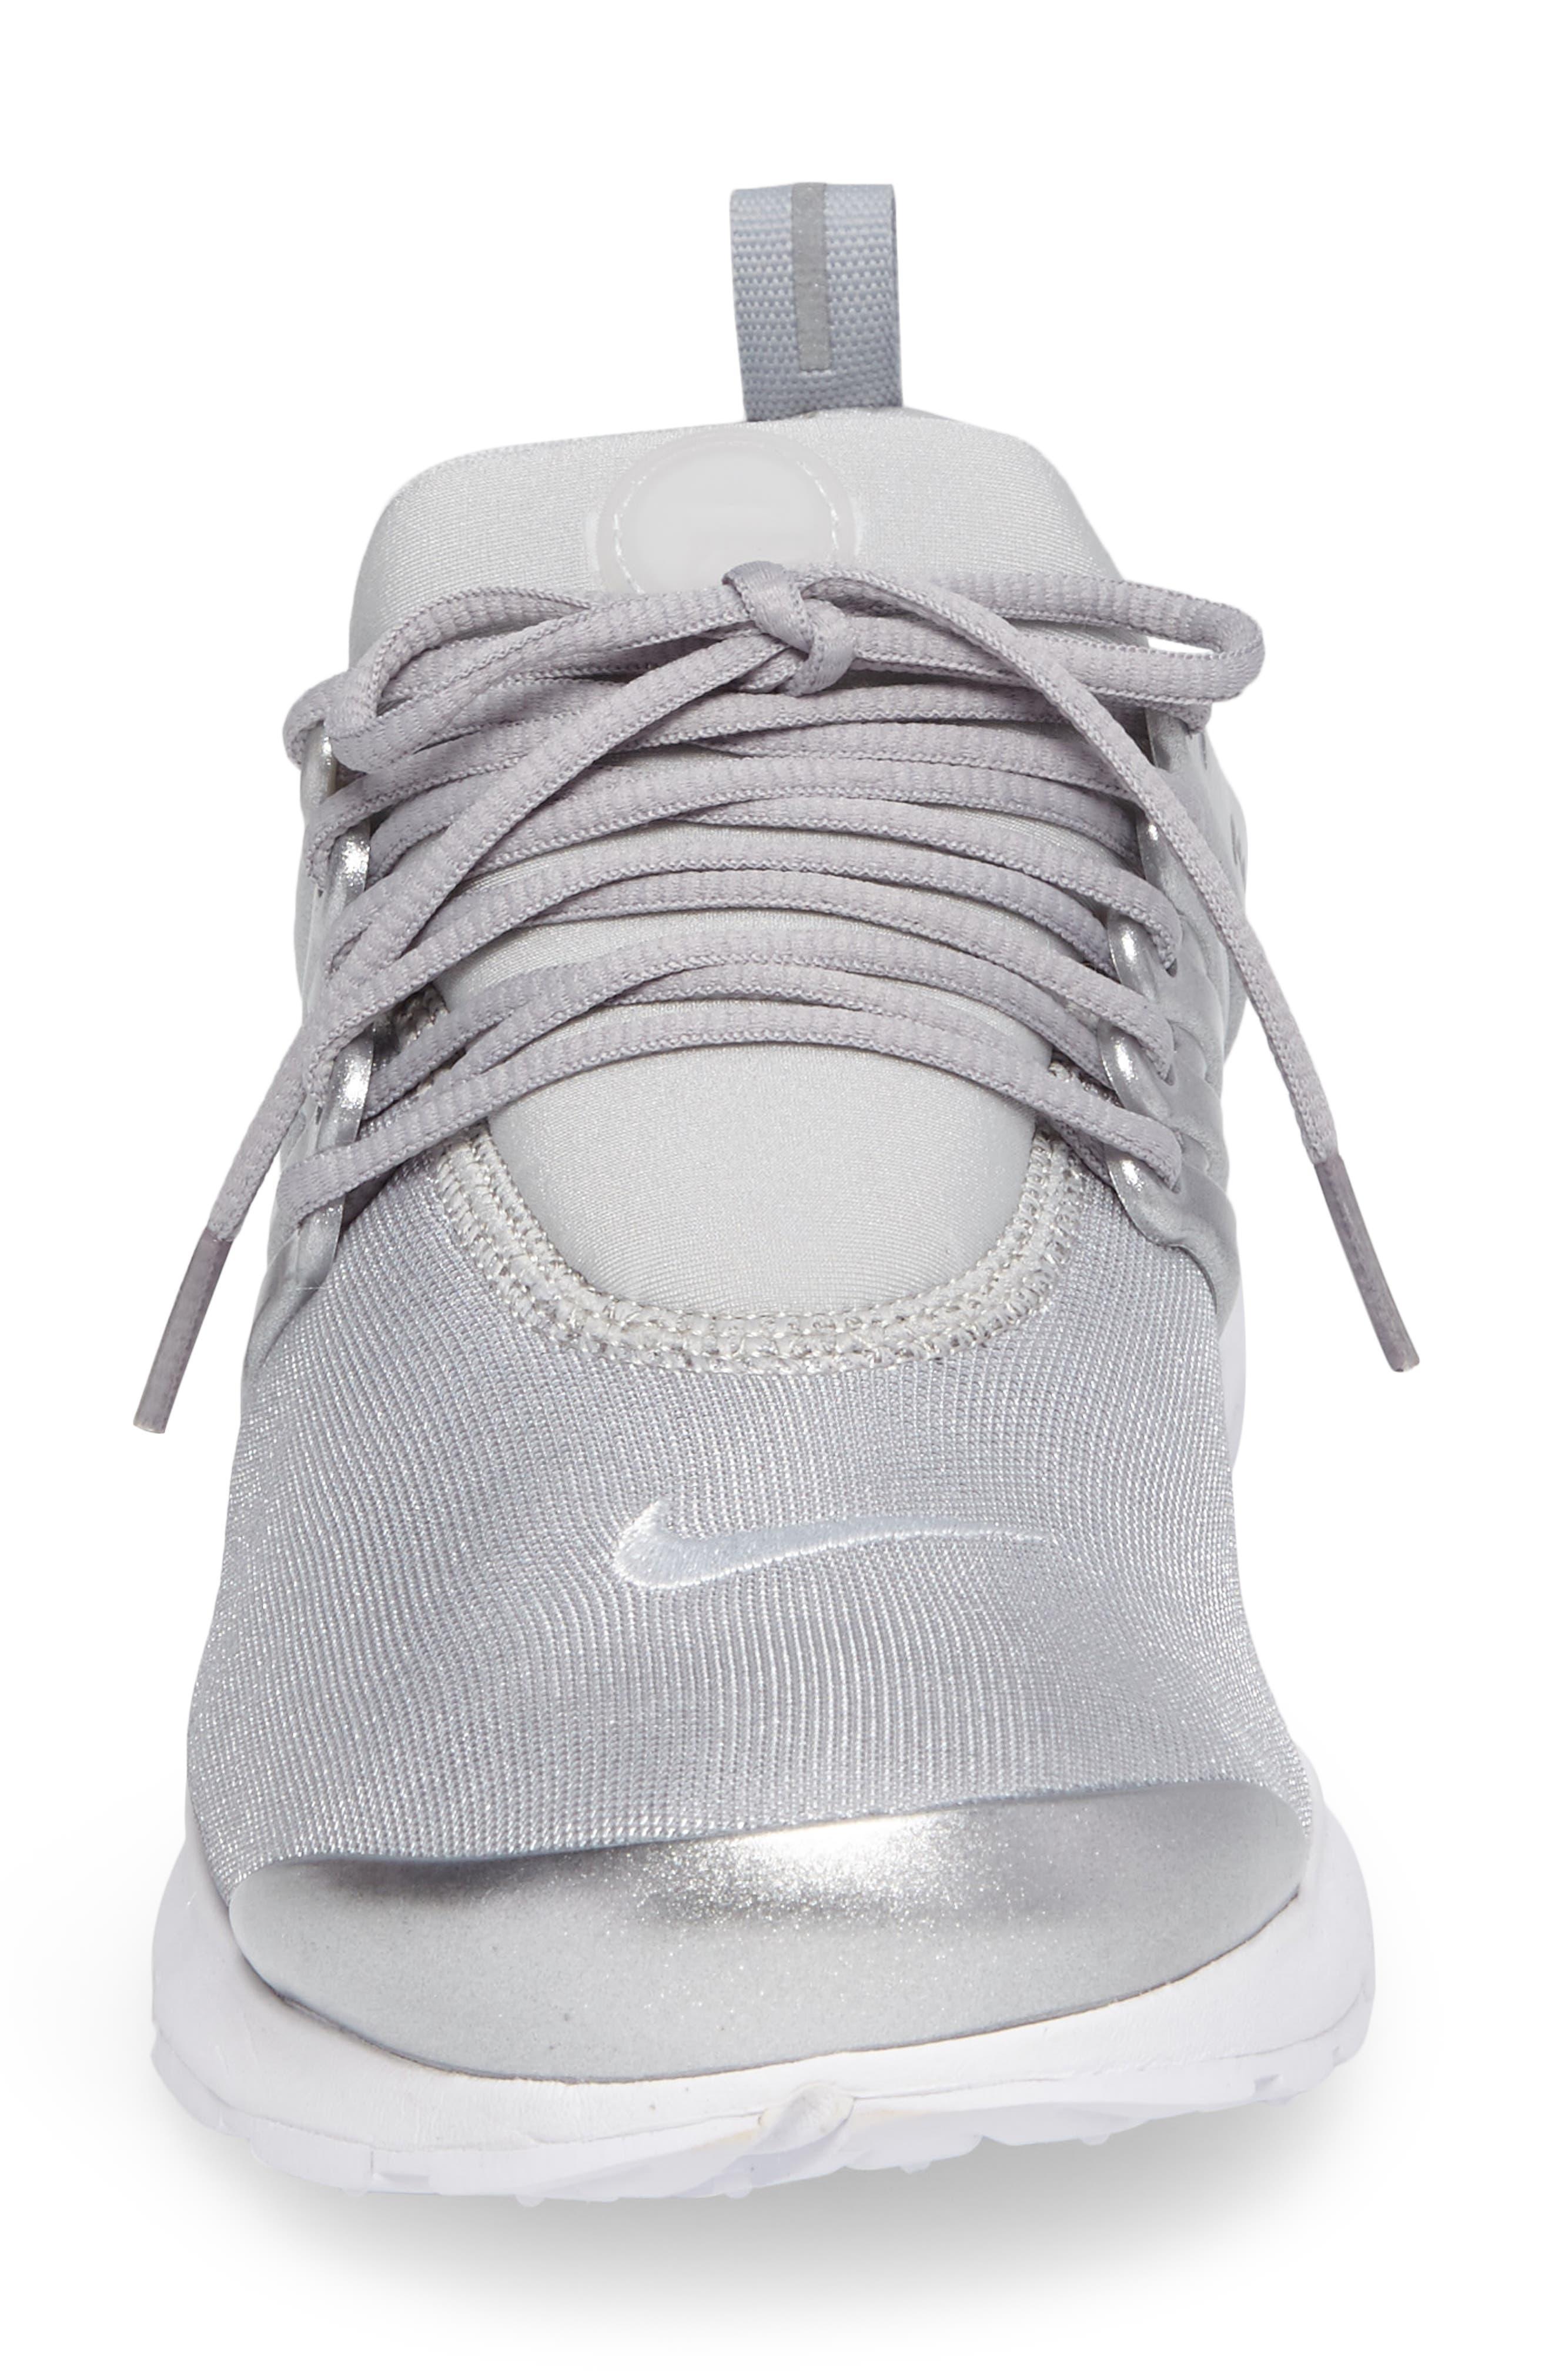 Air Presto Premium Sneaker,                             Alternate thumbnail 4, color,                             021